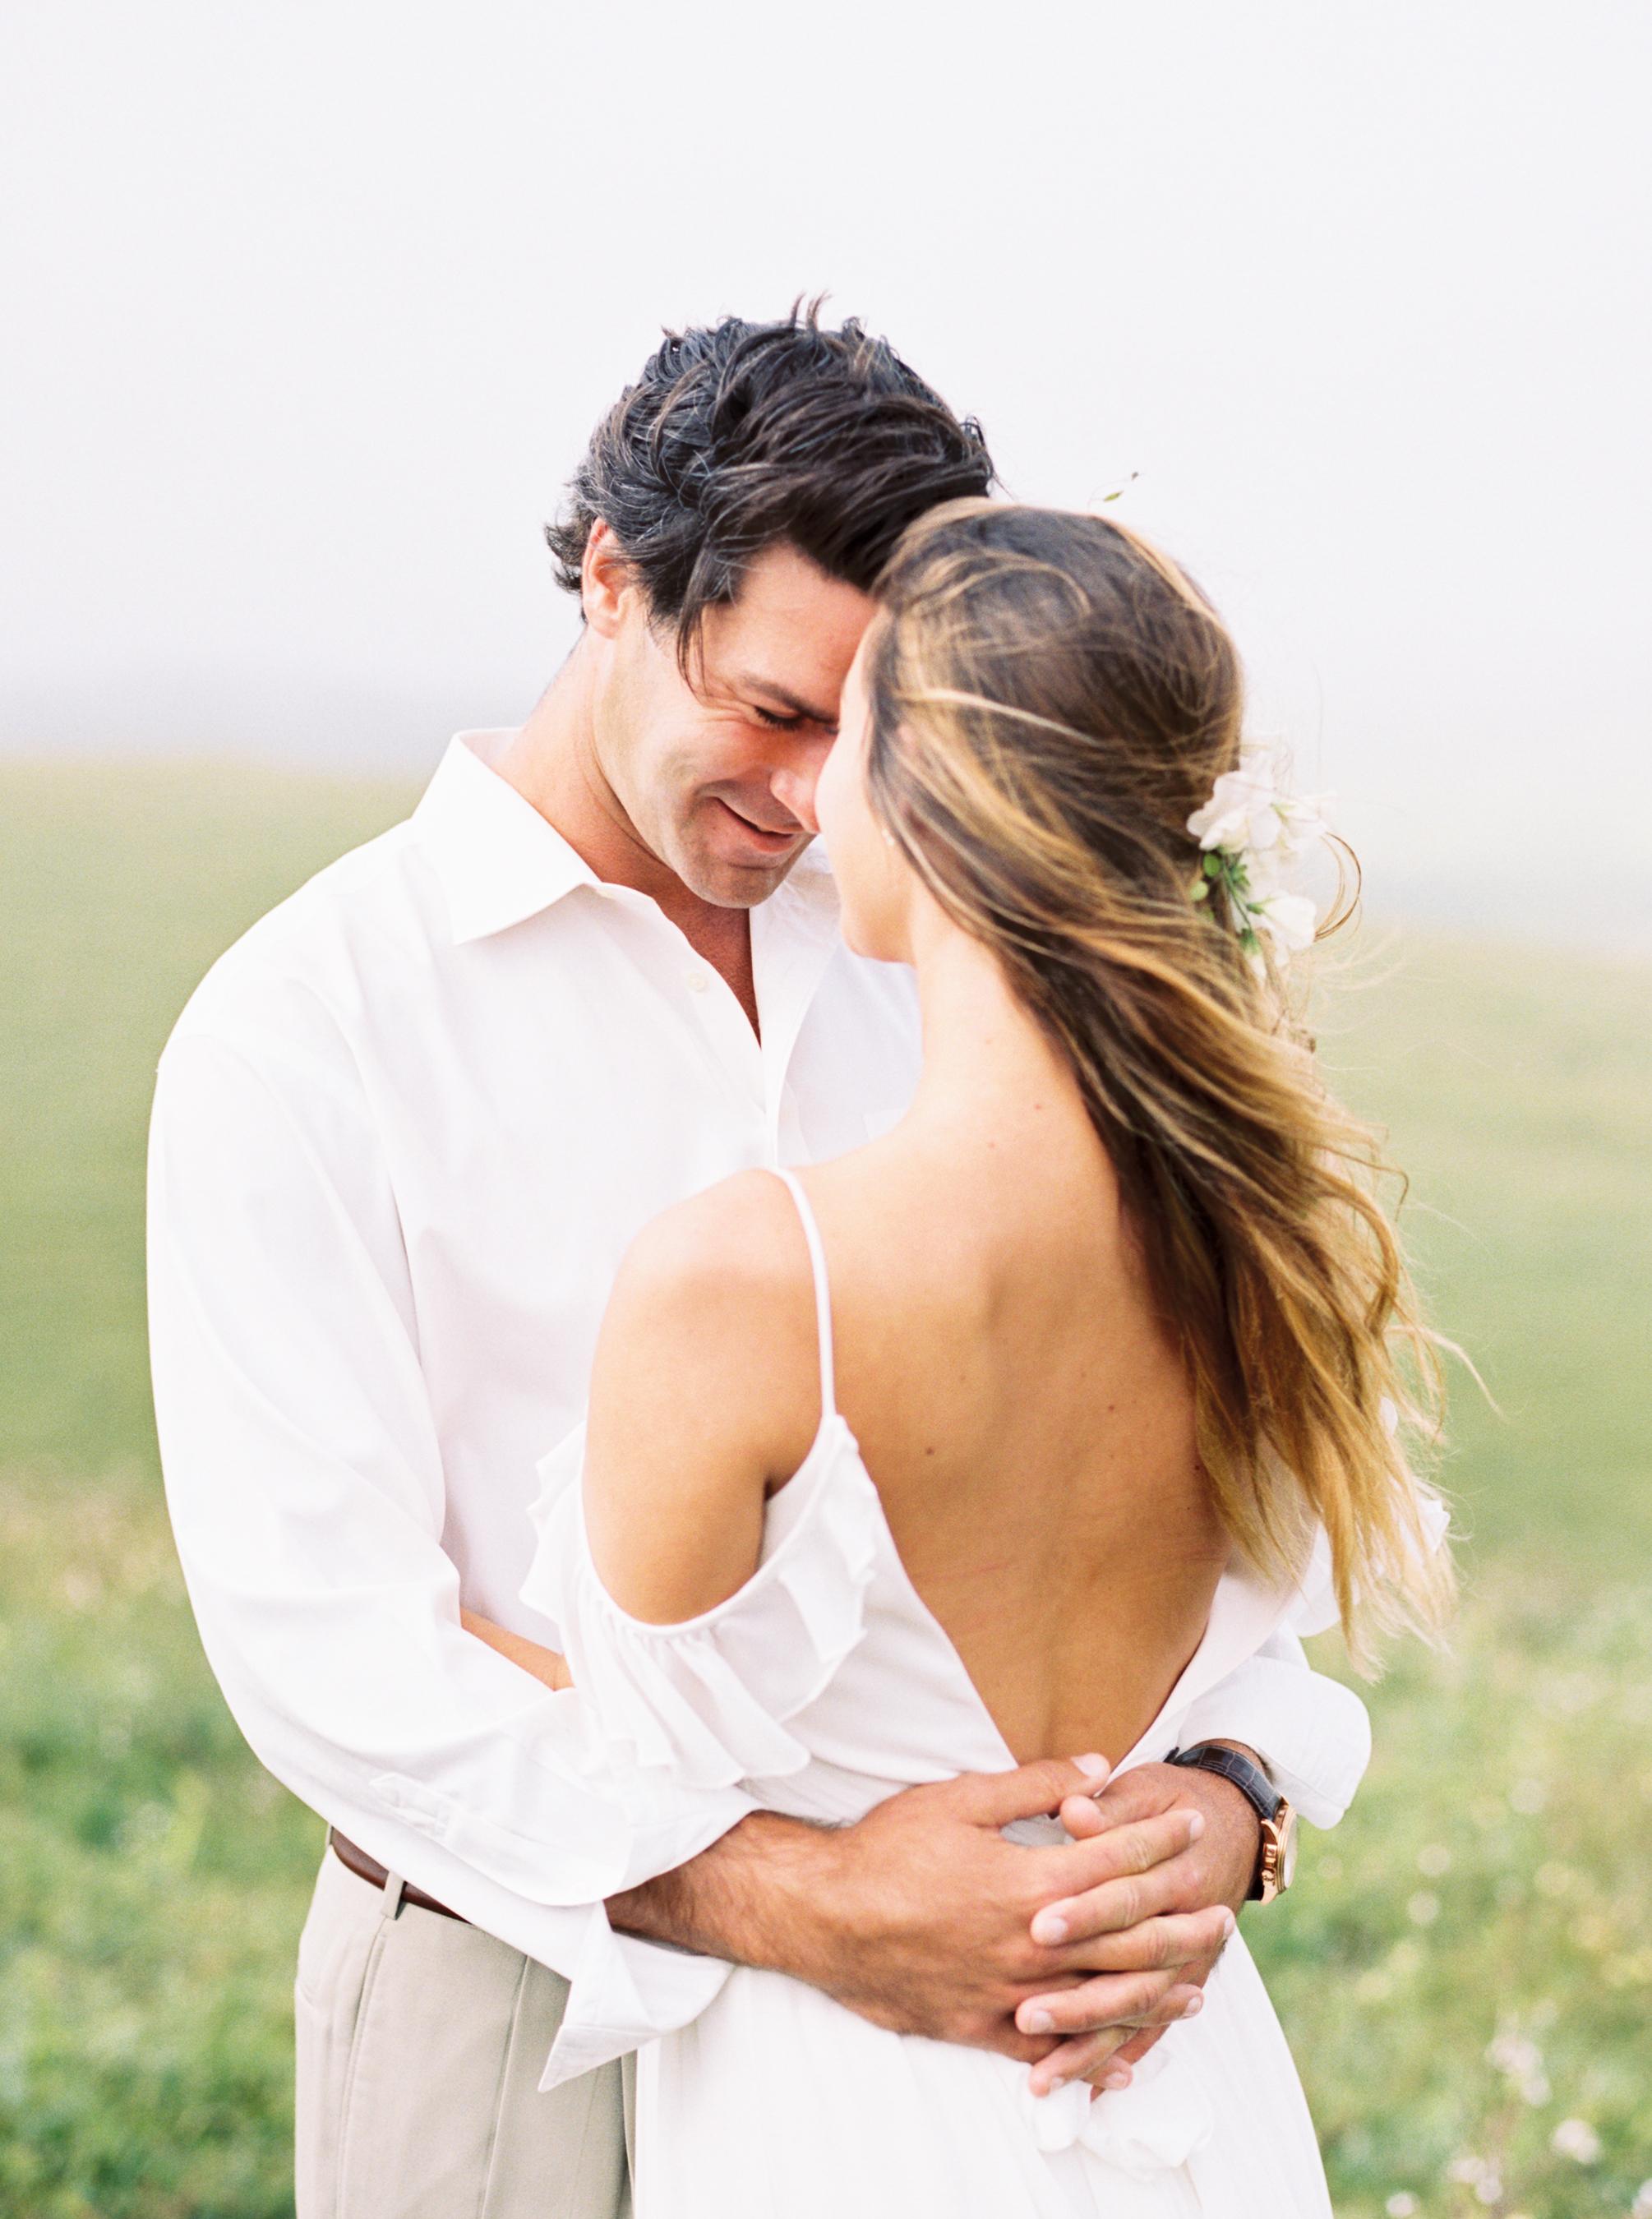 Danford-Photography-Bozeman-Montana-California-Wedding-Engagement-Photographer-9.jpg